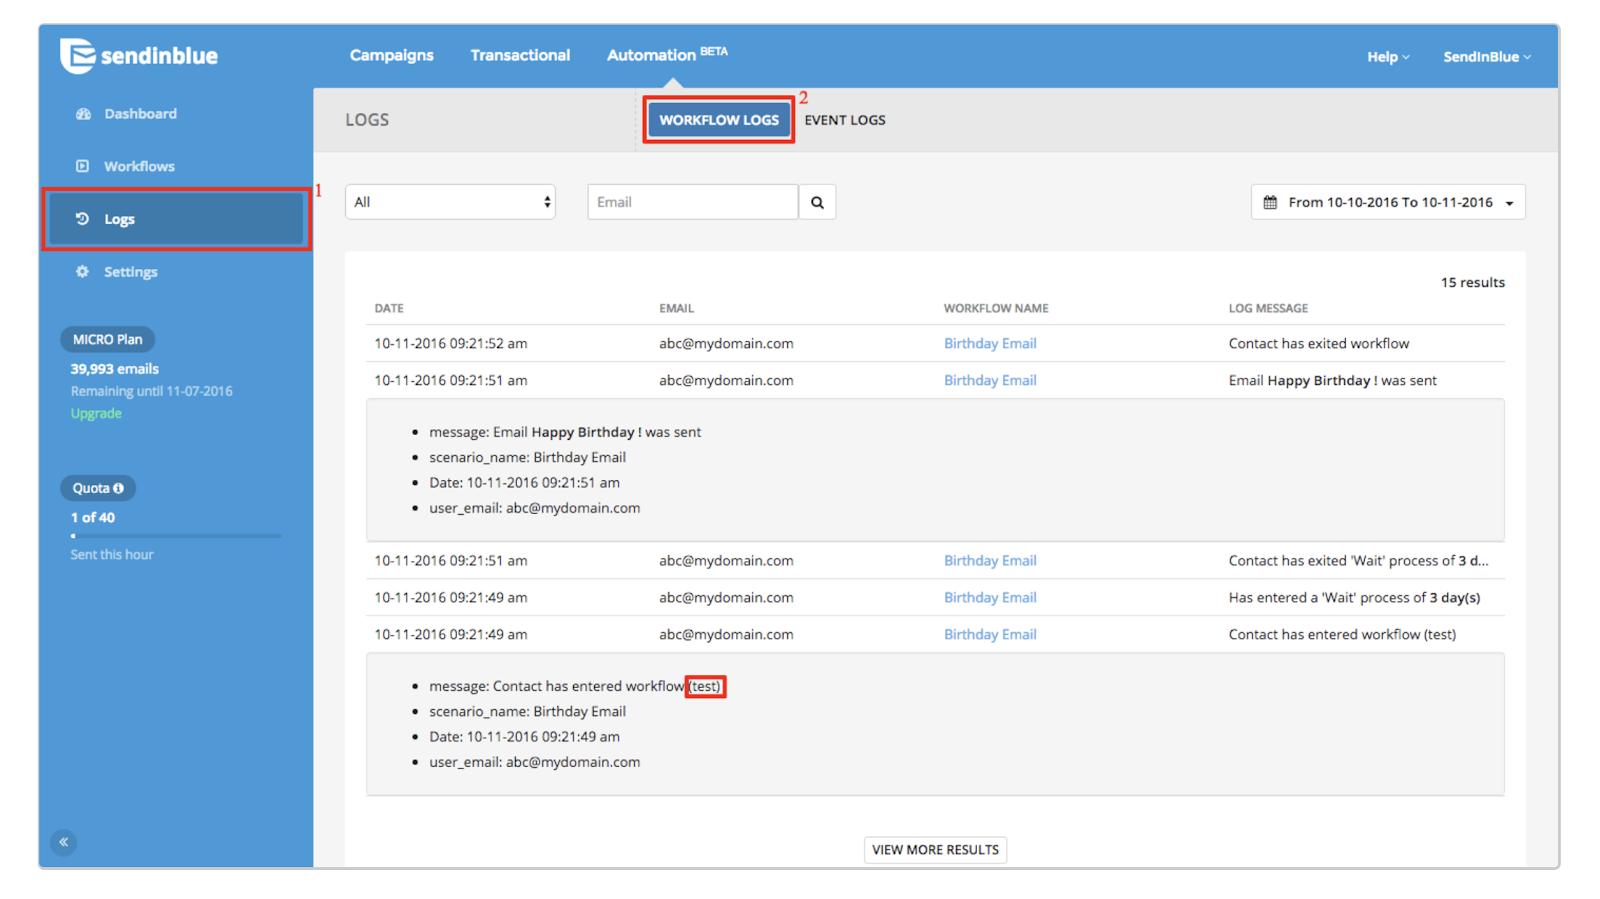 Workflow logs in Sendinblue